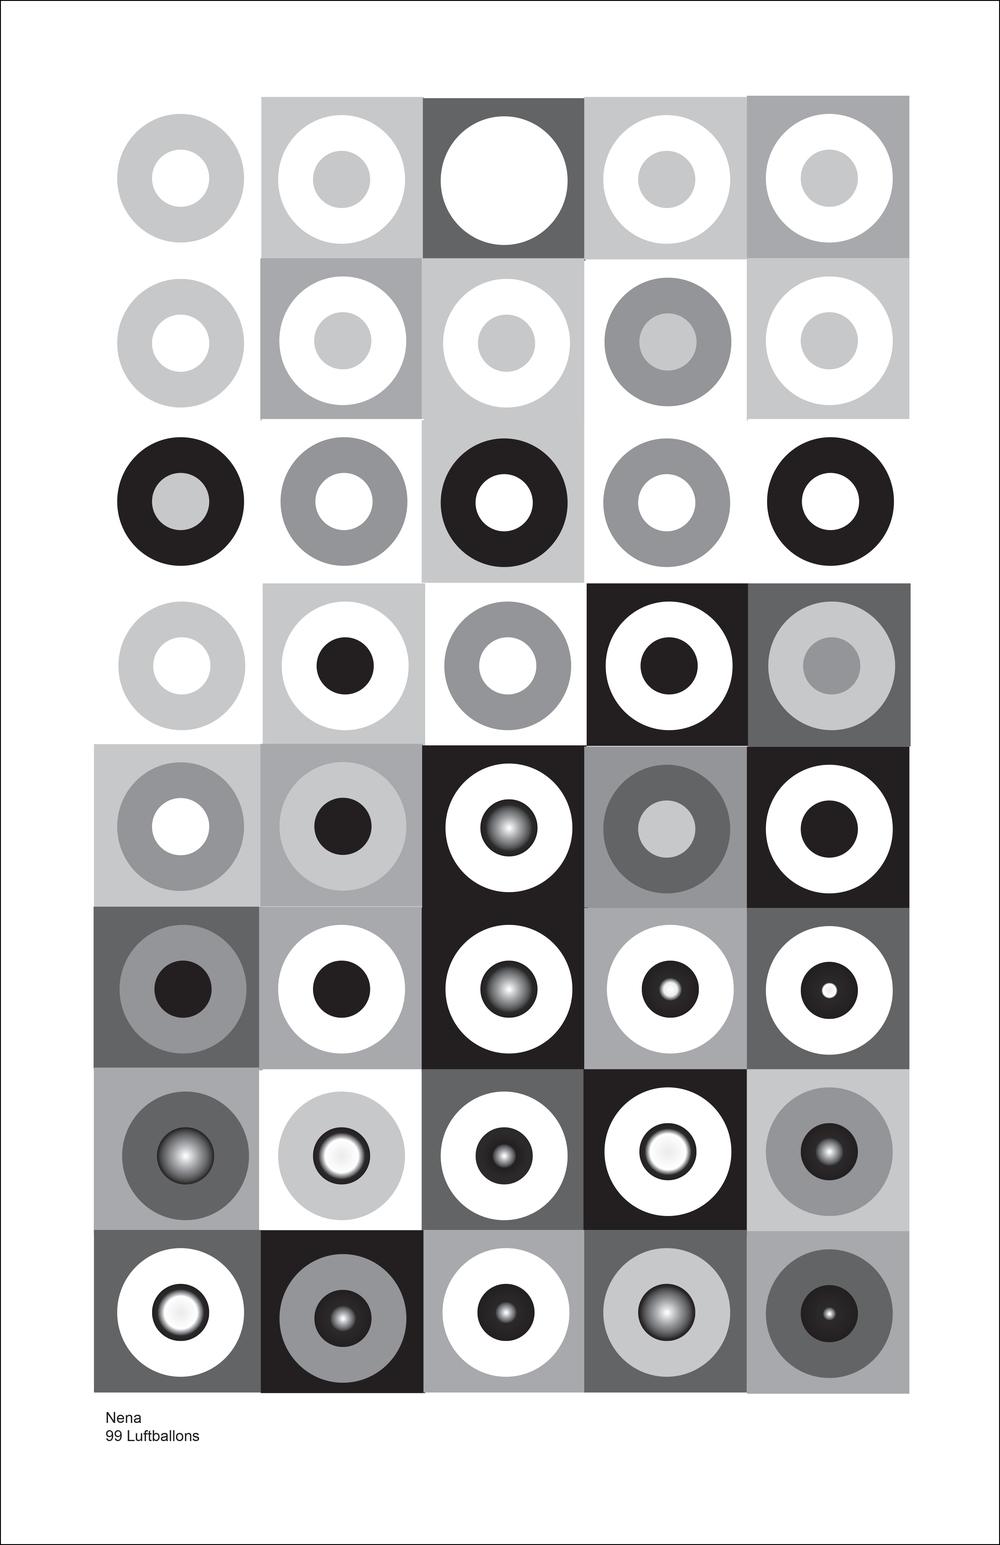 ART215 Illustrator/InDesign - Interpreting Music as Geometric Patterns: Jeremiah Johnson